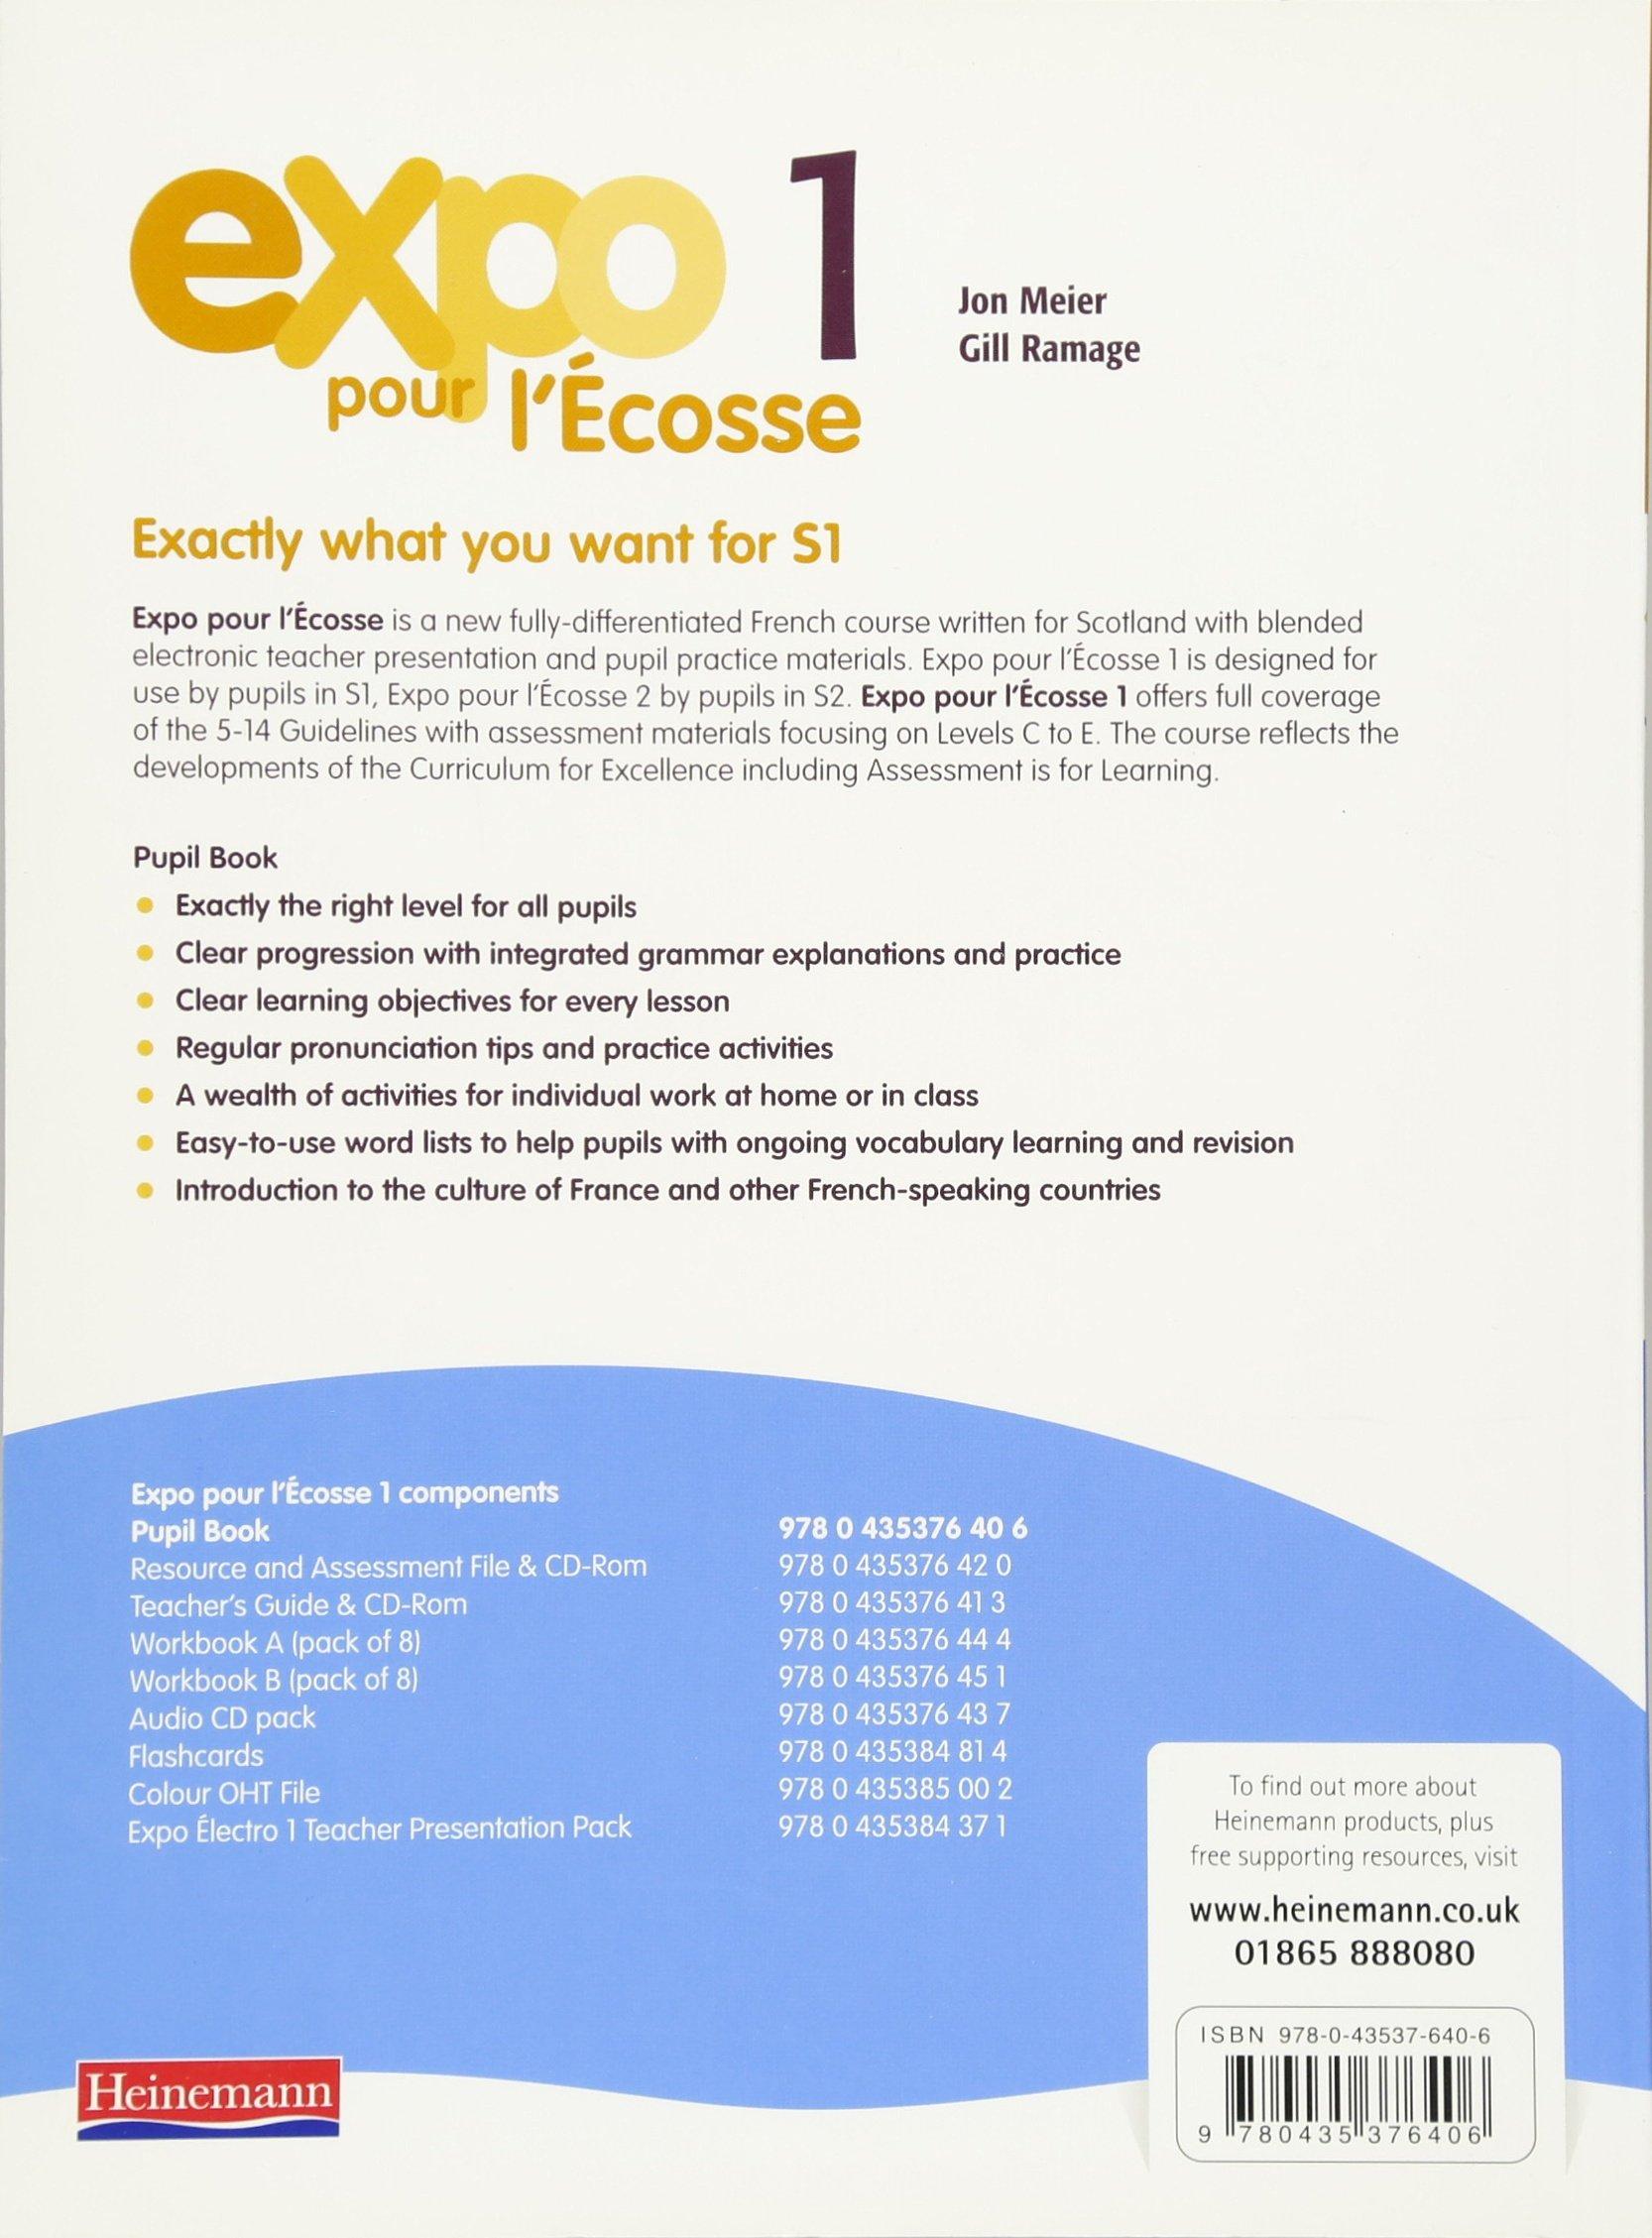 expo pour l ecosse pupil books for s1 and s2 bk 1 jon meier rh amazon com Teacher Resource Guide Teacher Black Students Guide